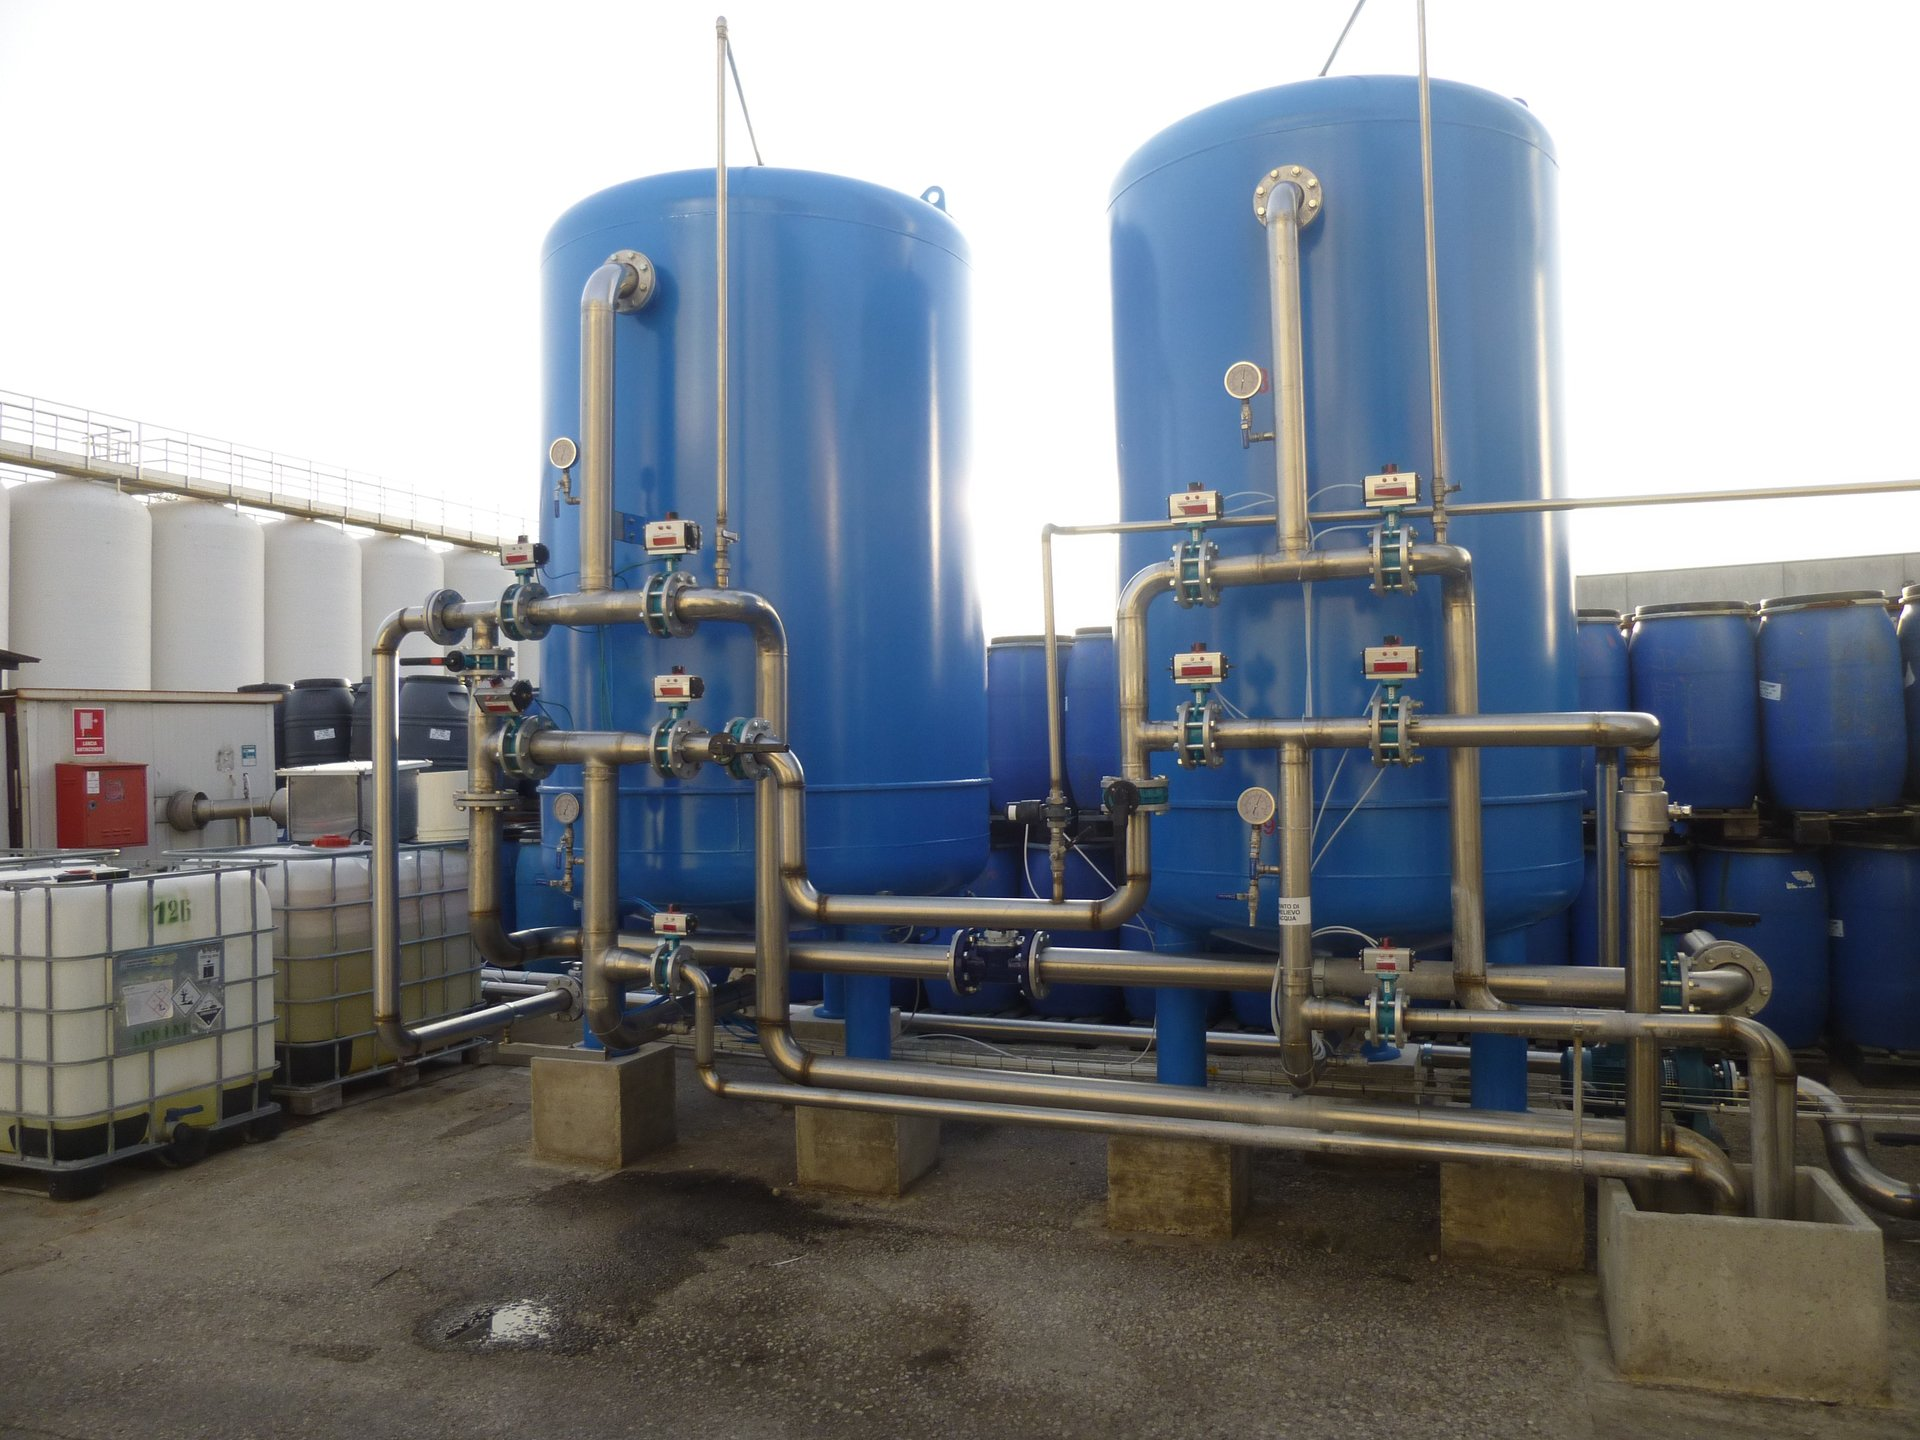 Addolcitori acque per l'industria